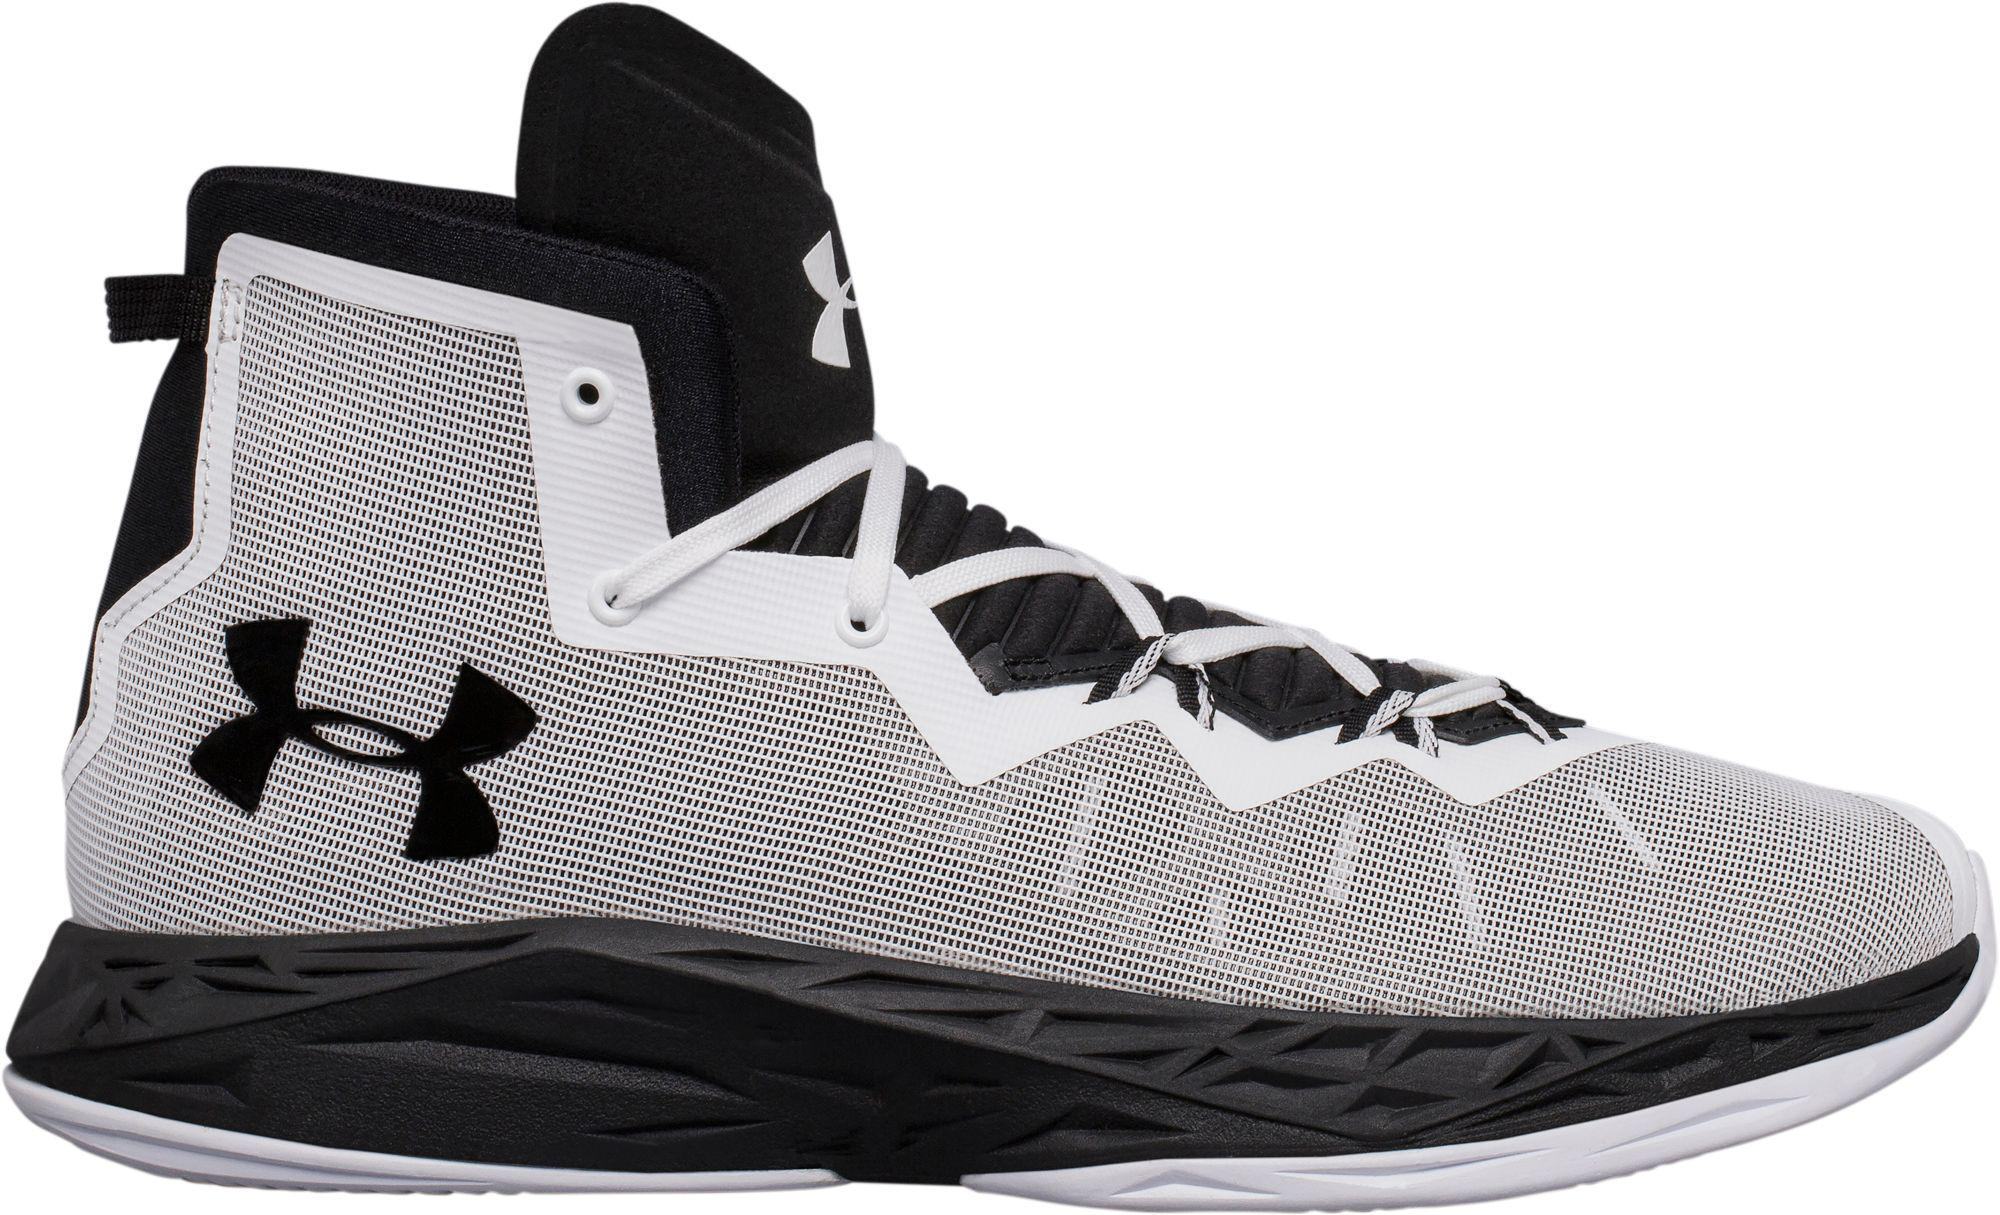 Under Armour Black Lightning 4 Basketball Shoes For Men